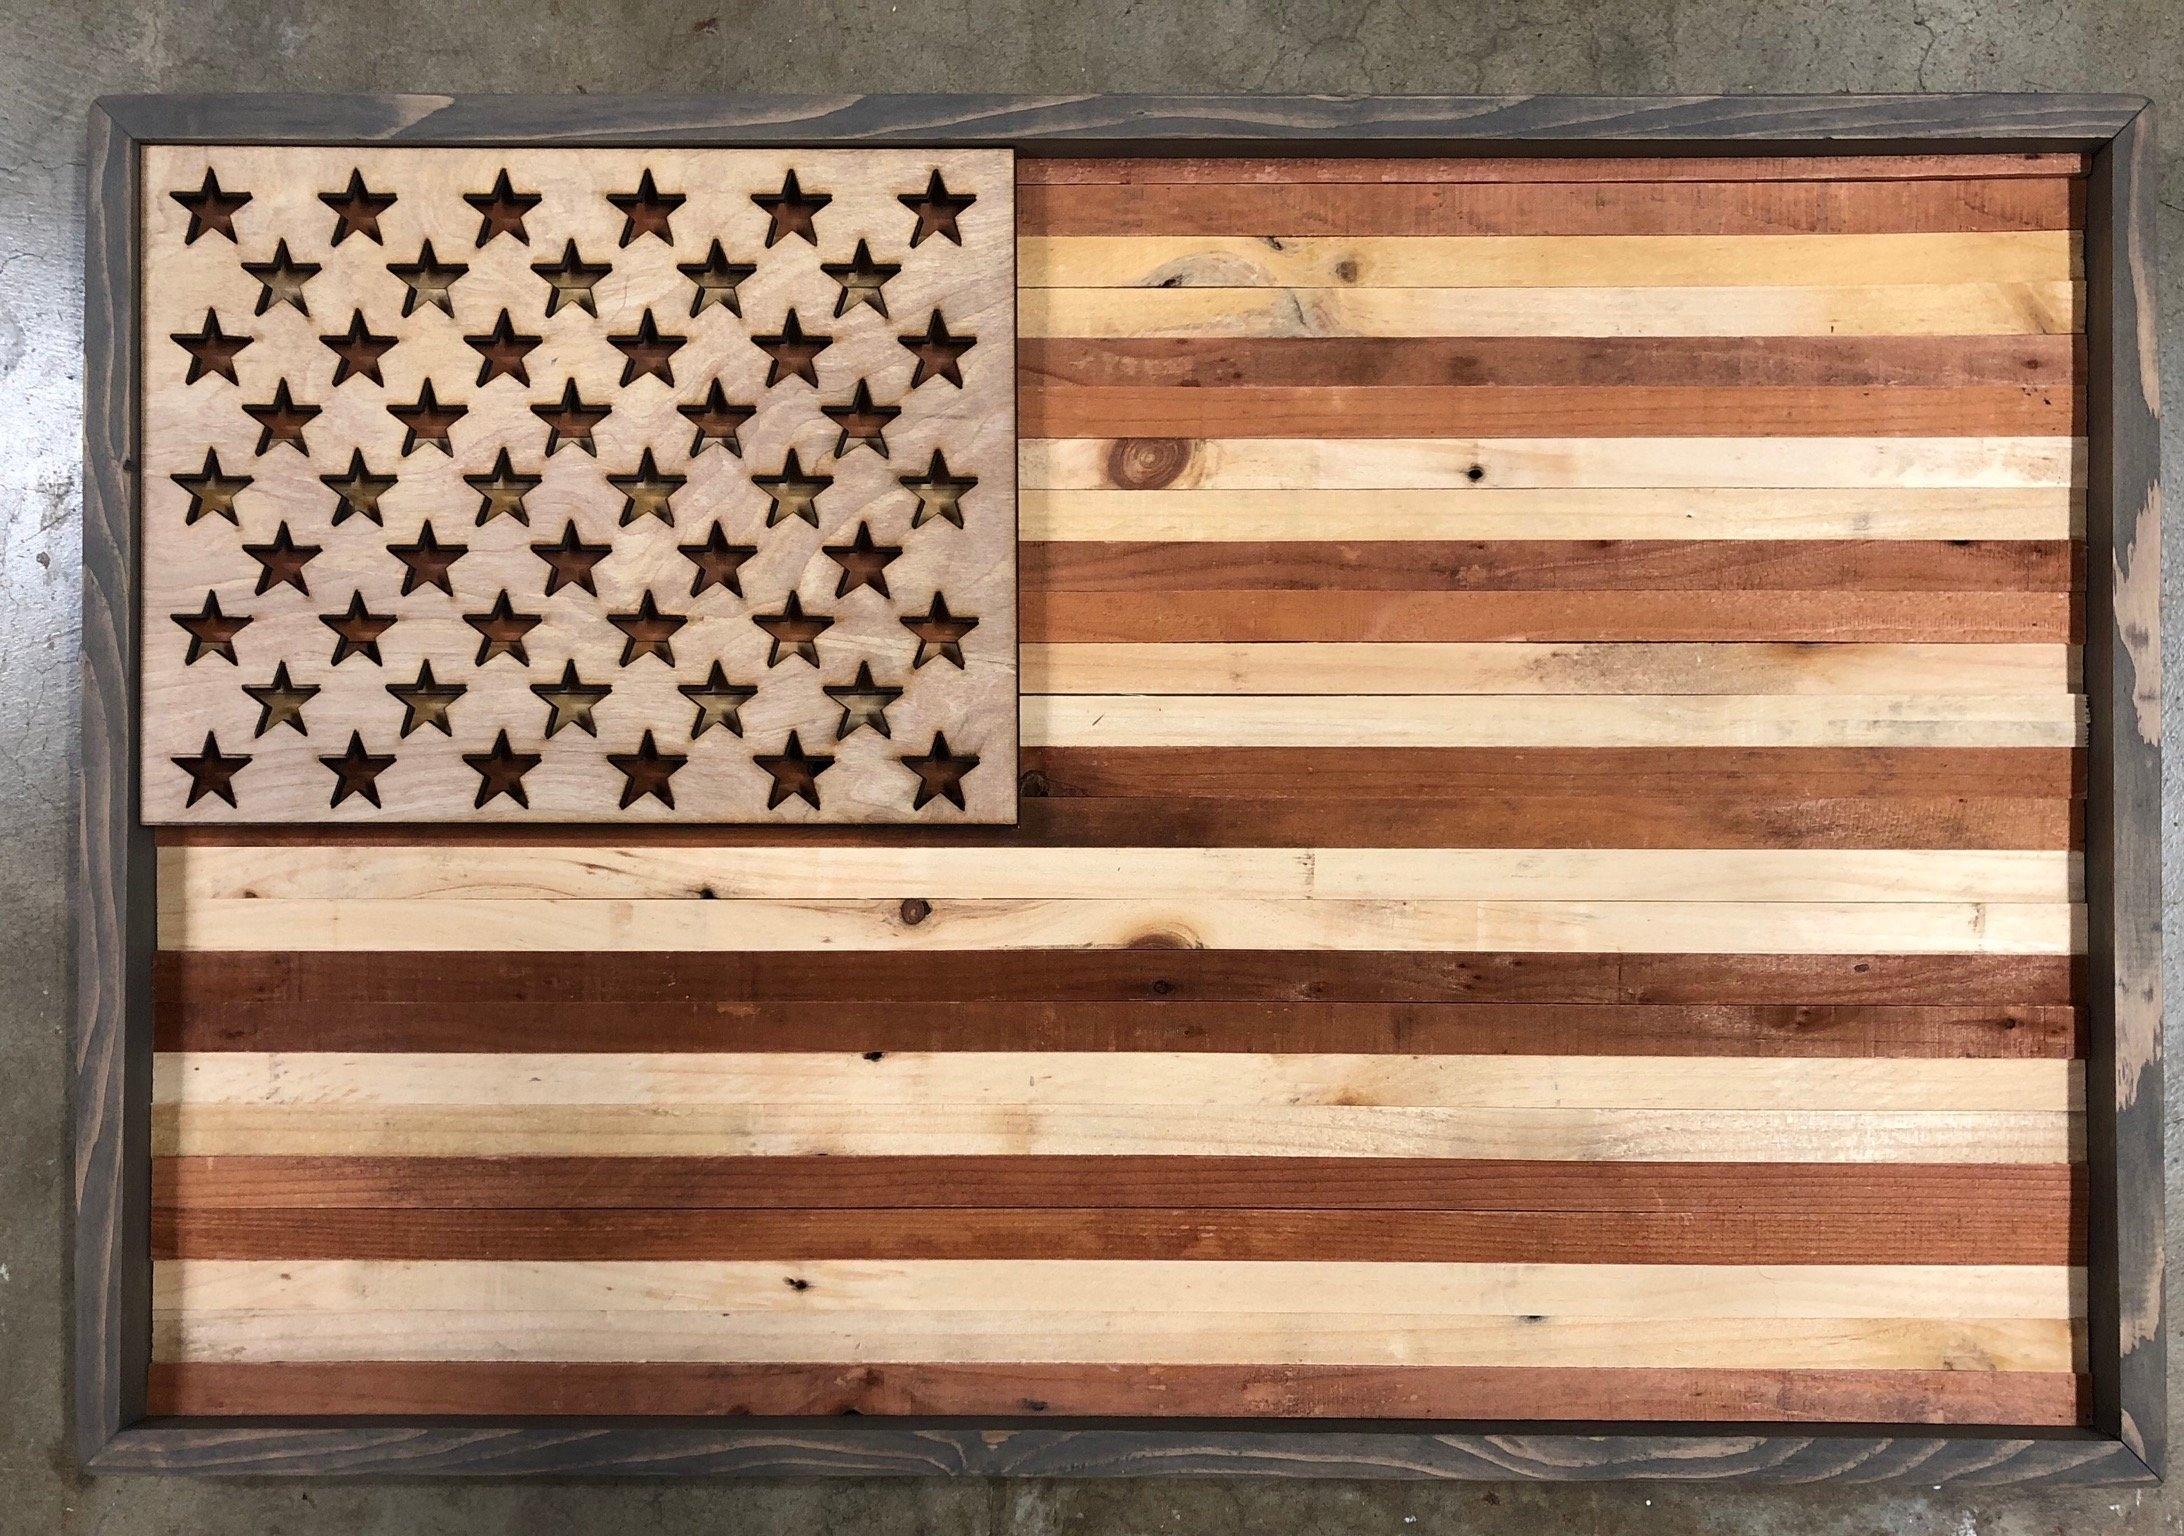 Rustic American Flag Wall Art Inside Rustic American Flag Wall Art (View 9 of 20)